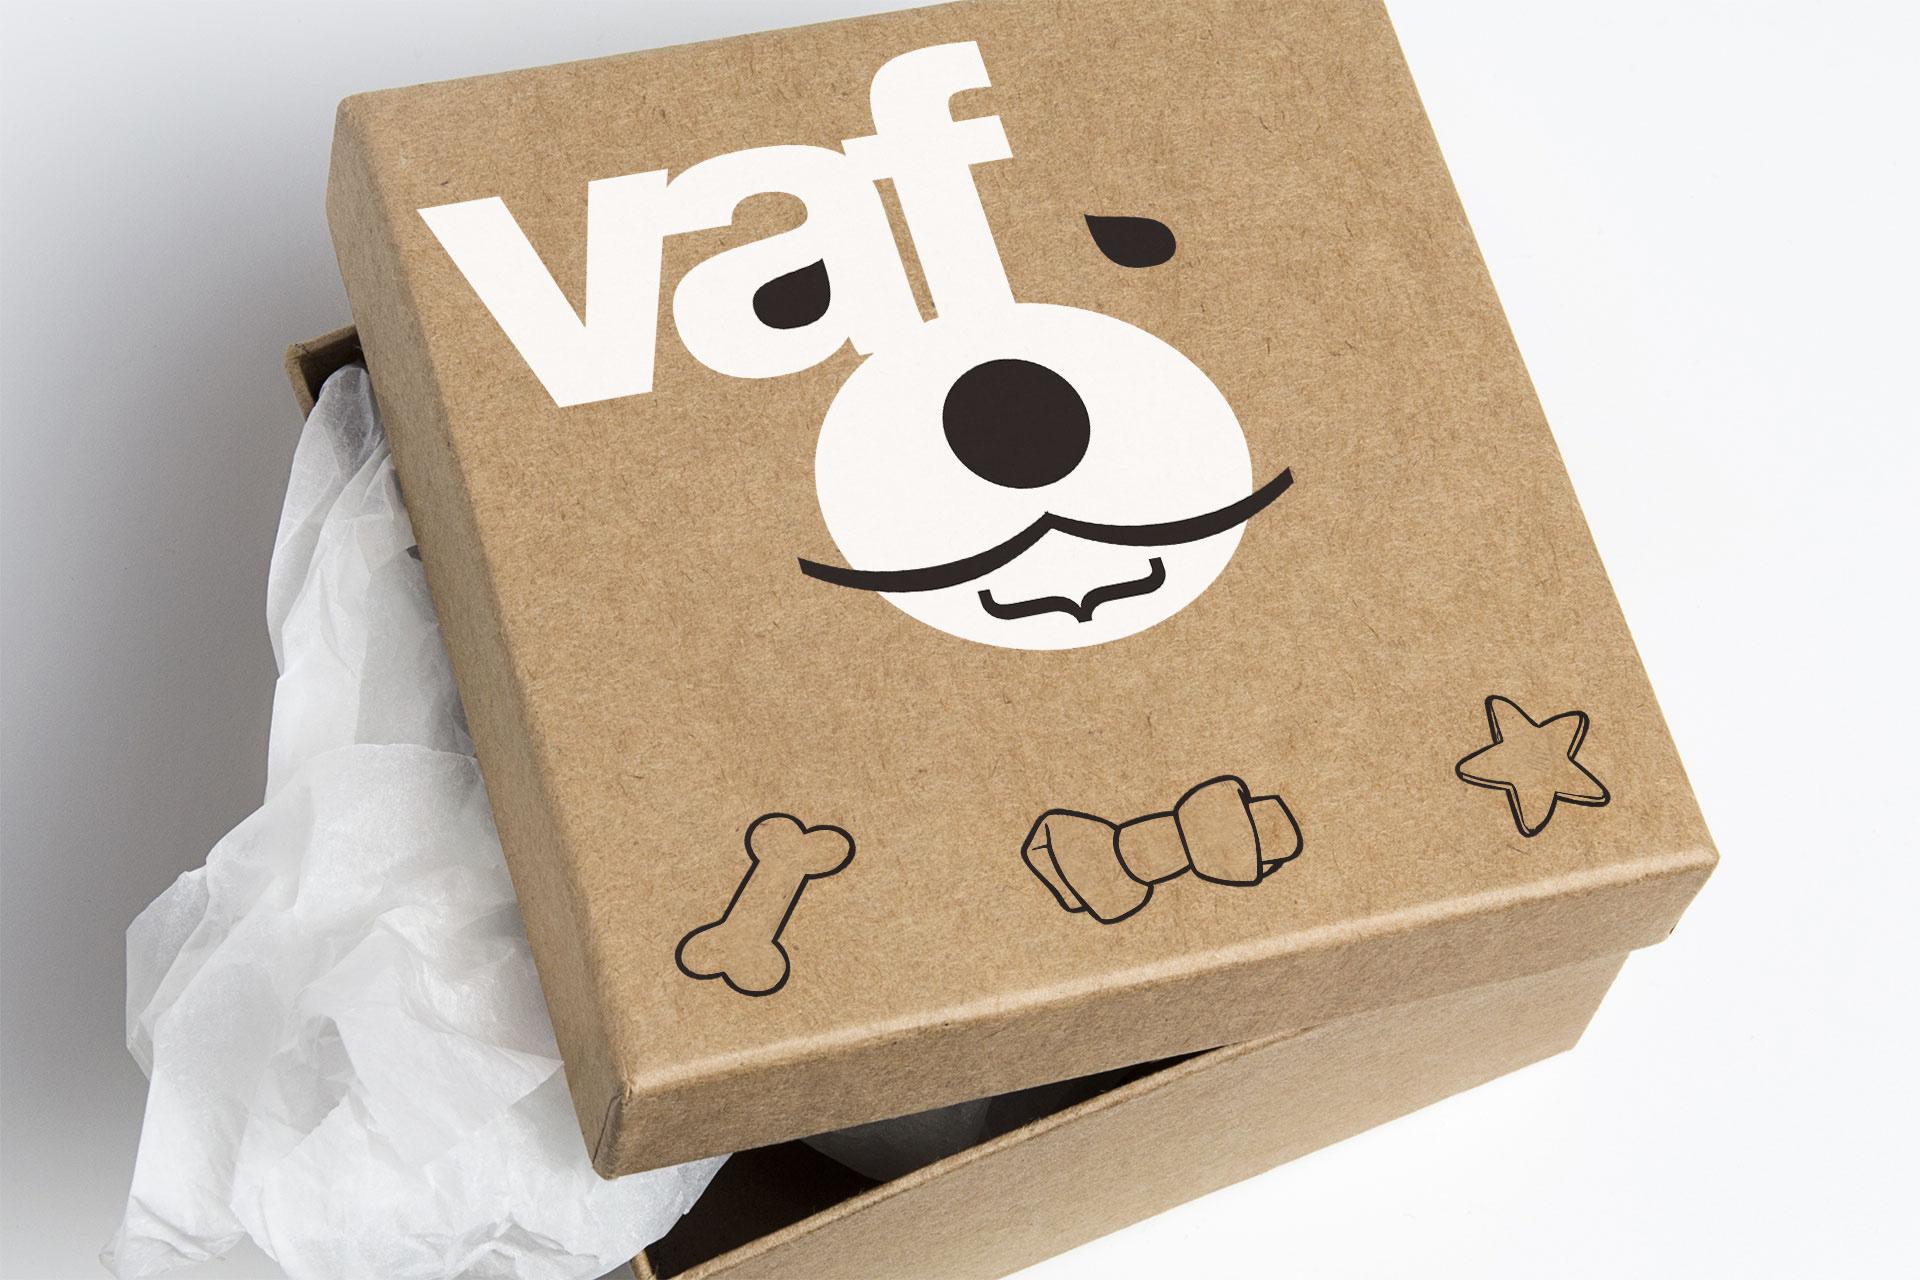 vaf_pekarna_marko_marinsek_ma-ma_studio_packaging